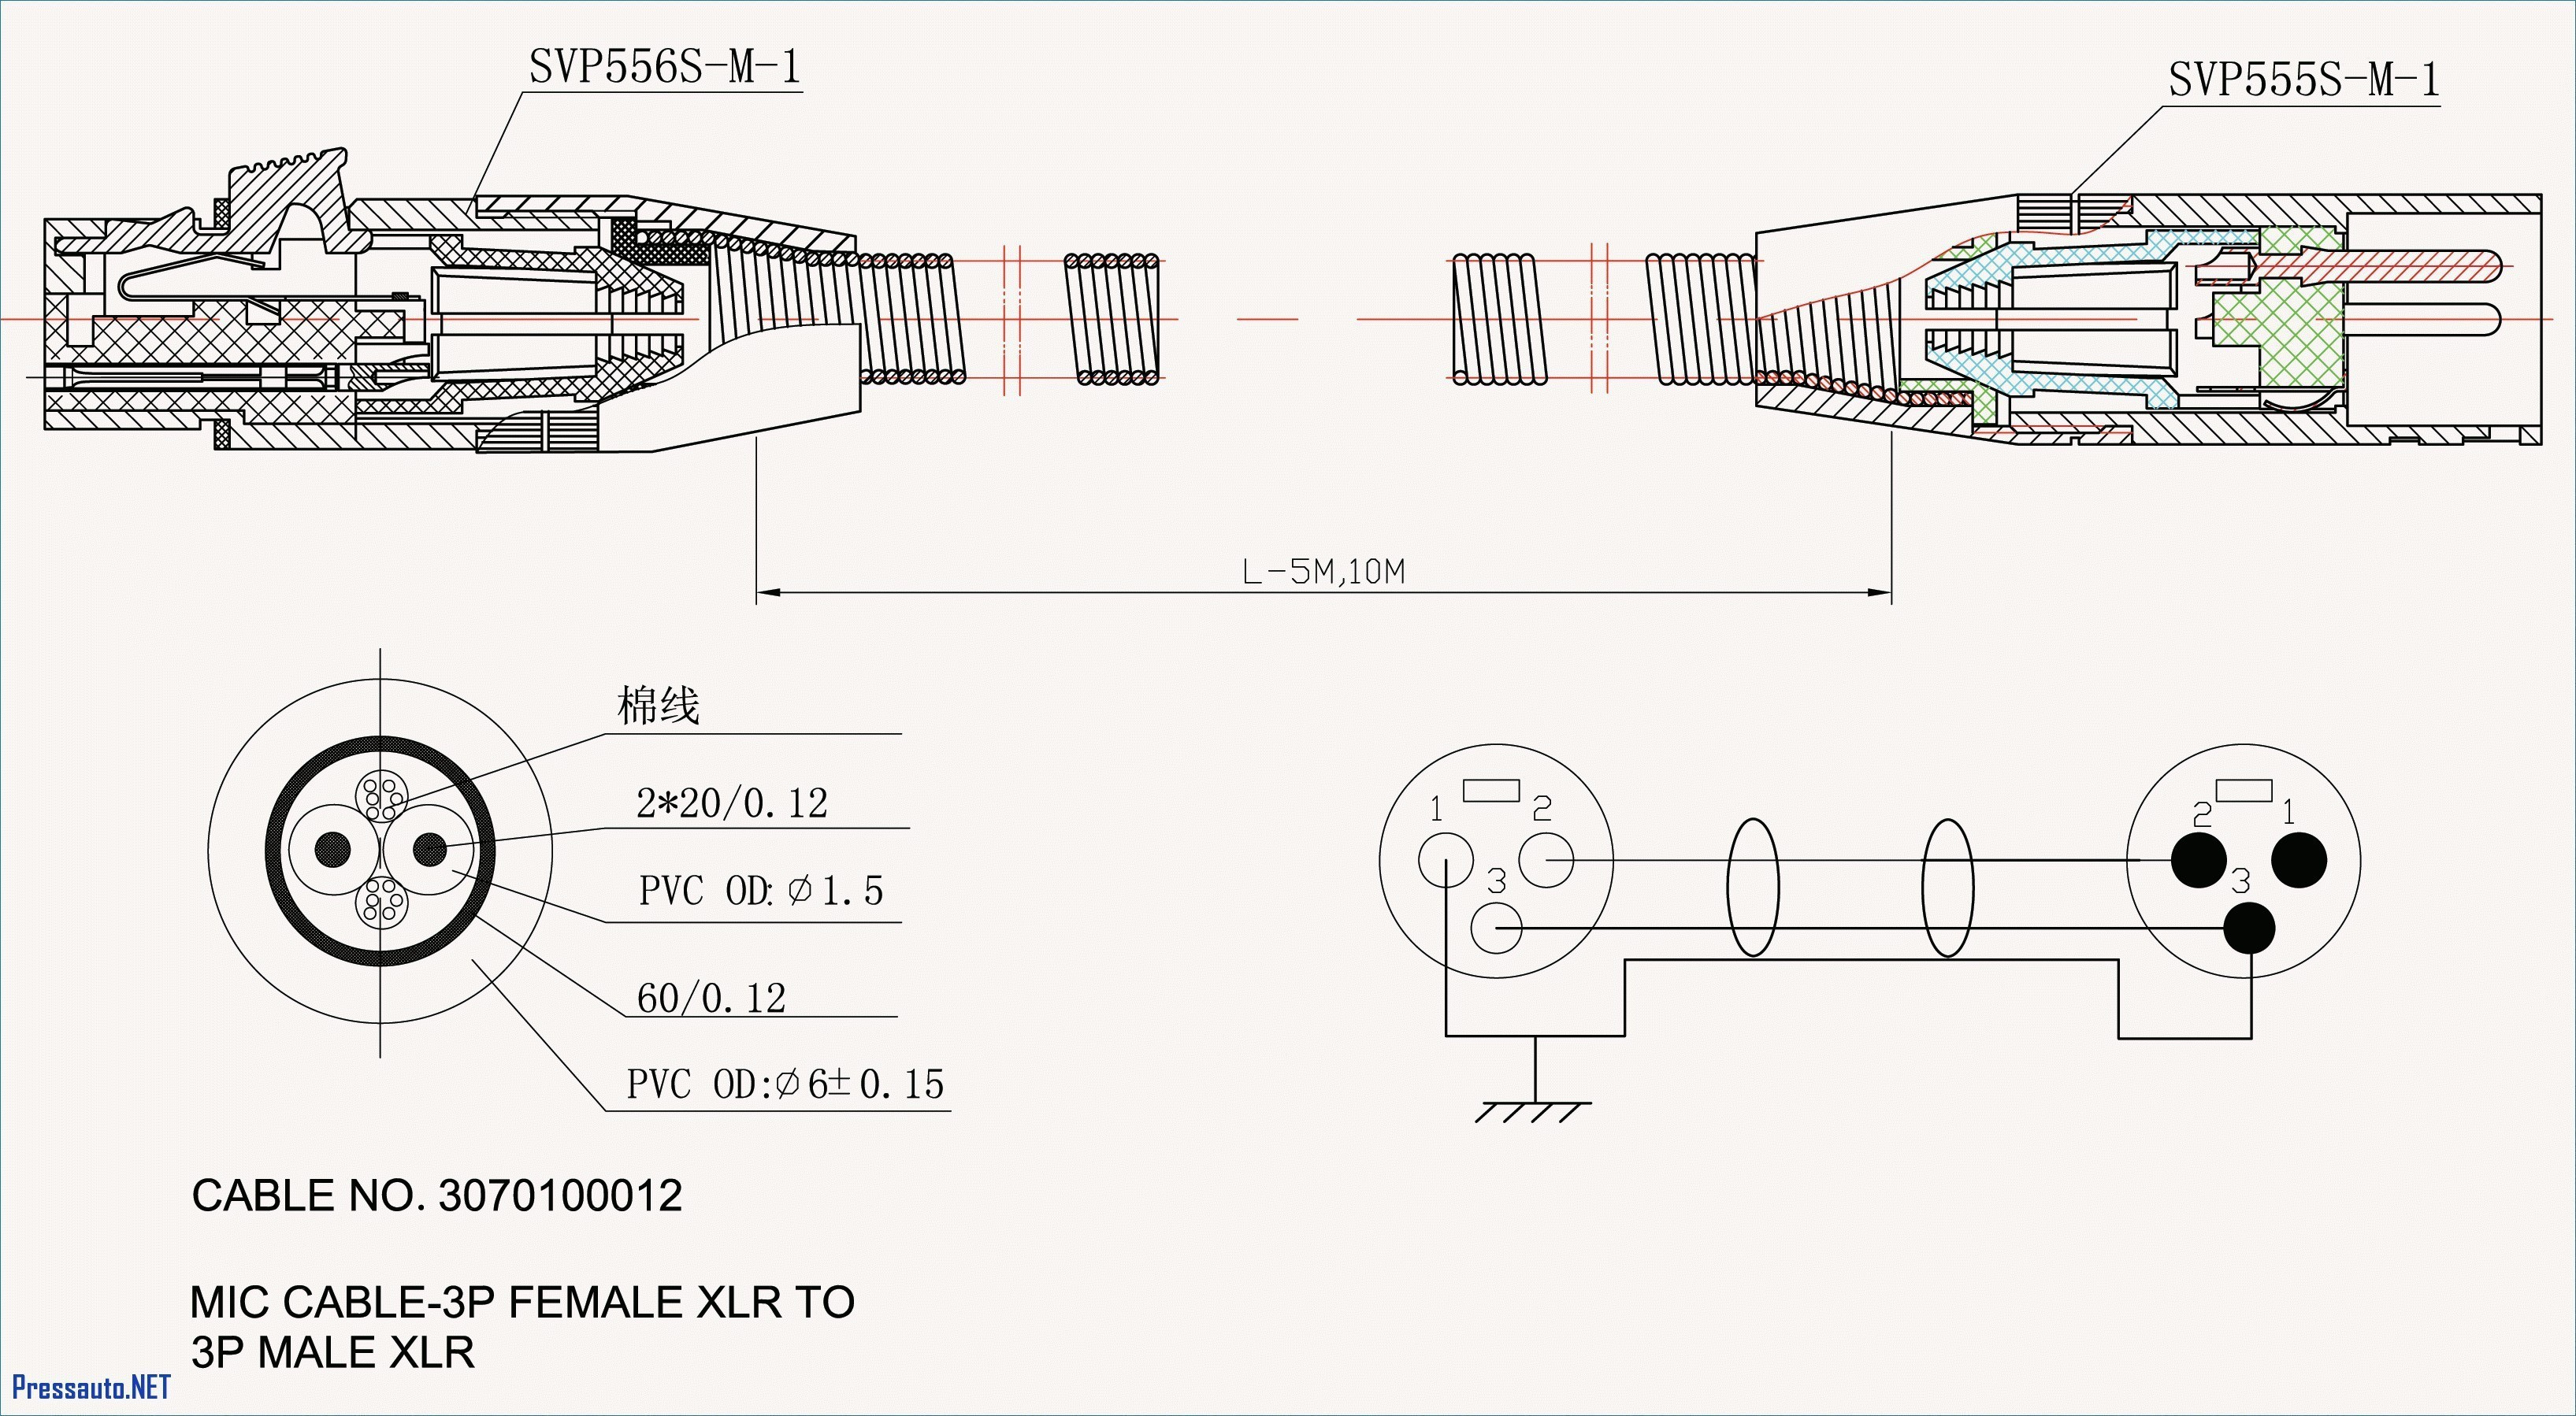 Diagram Of Car Charging System Wiring Diagram Car Charging System Luxury Best Wiring Diagram Of Diagram Of Car Charging System